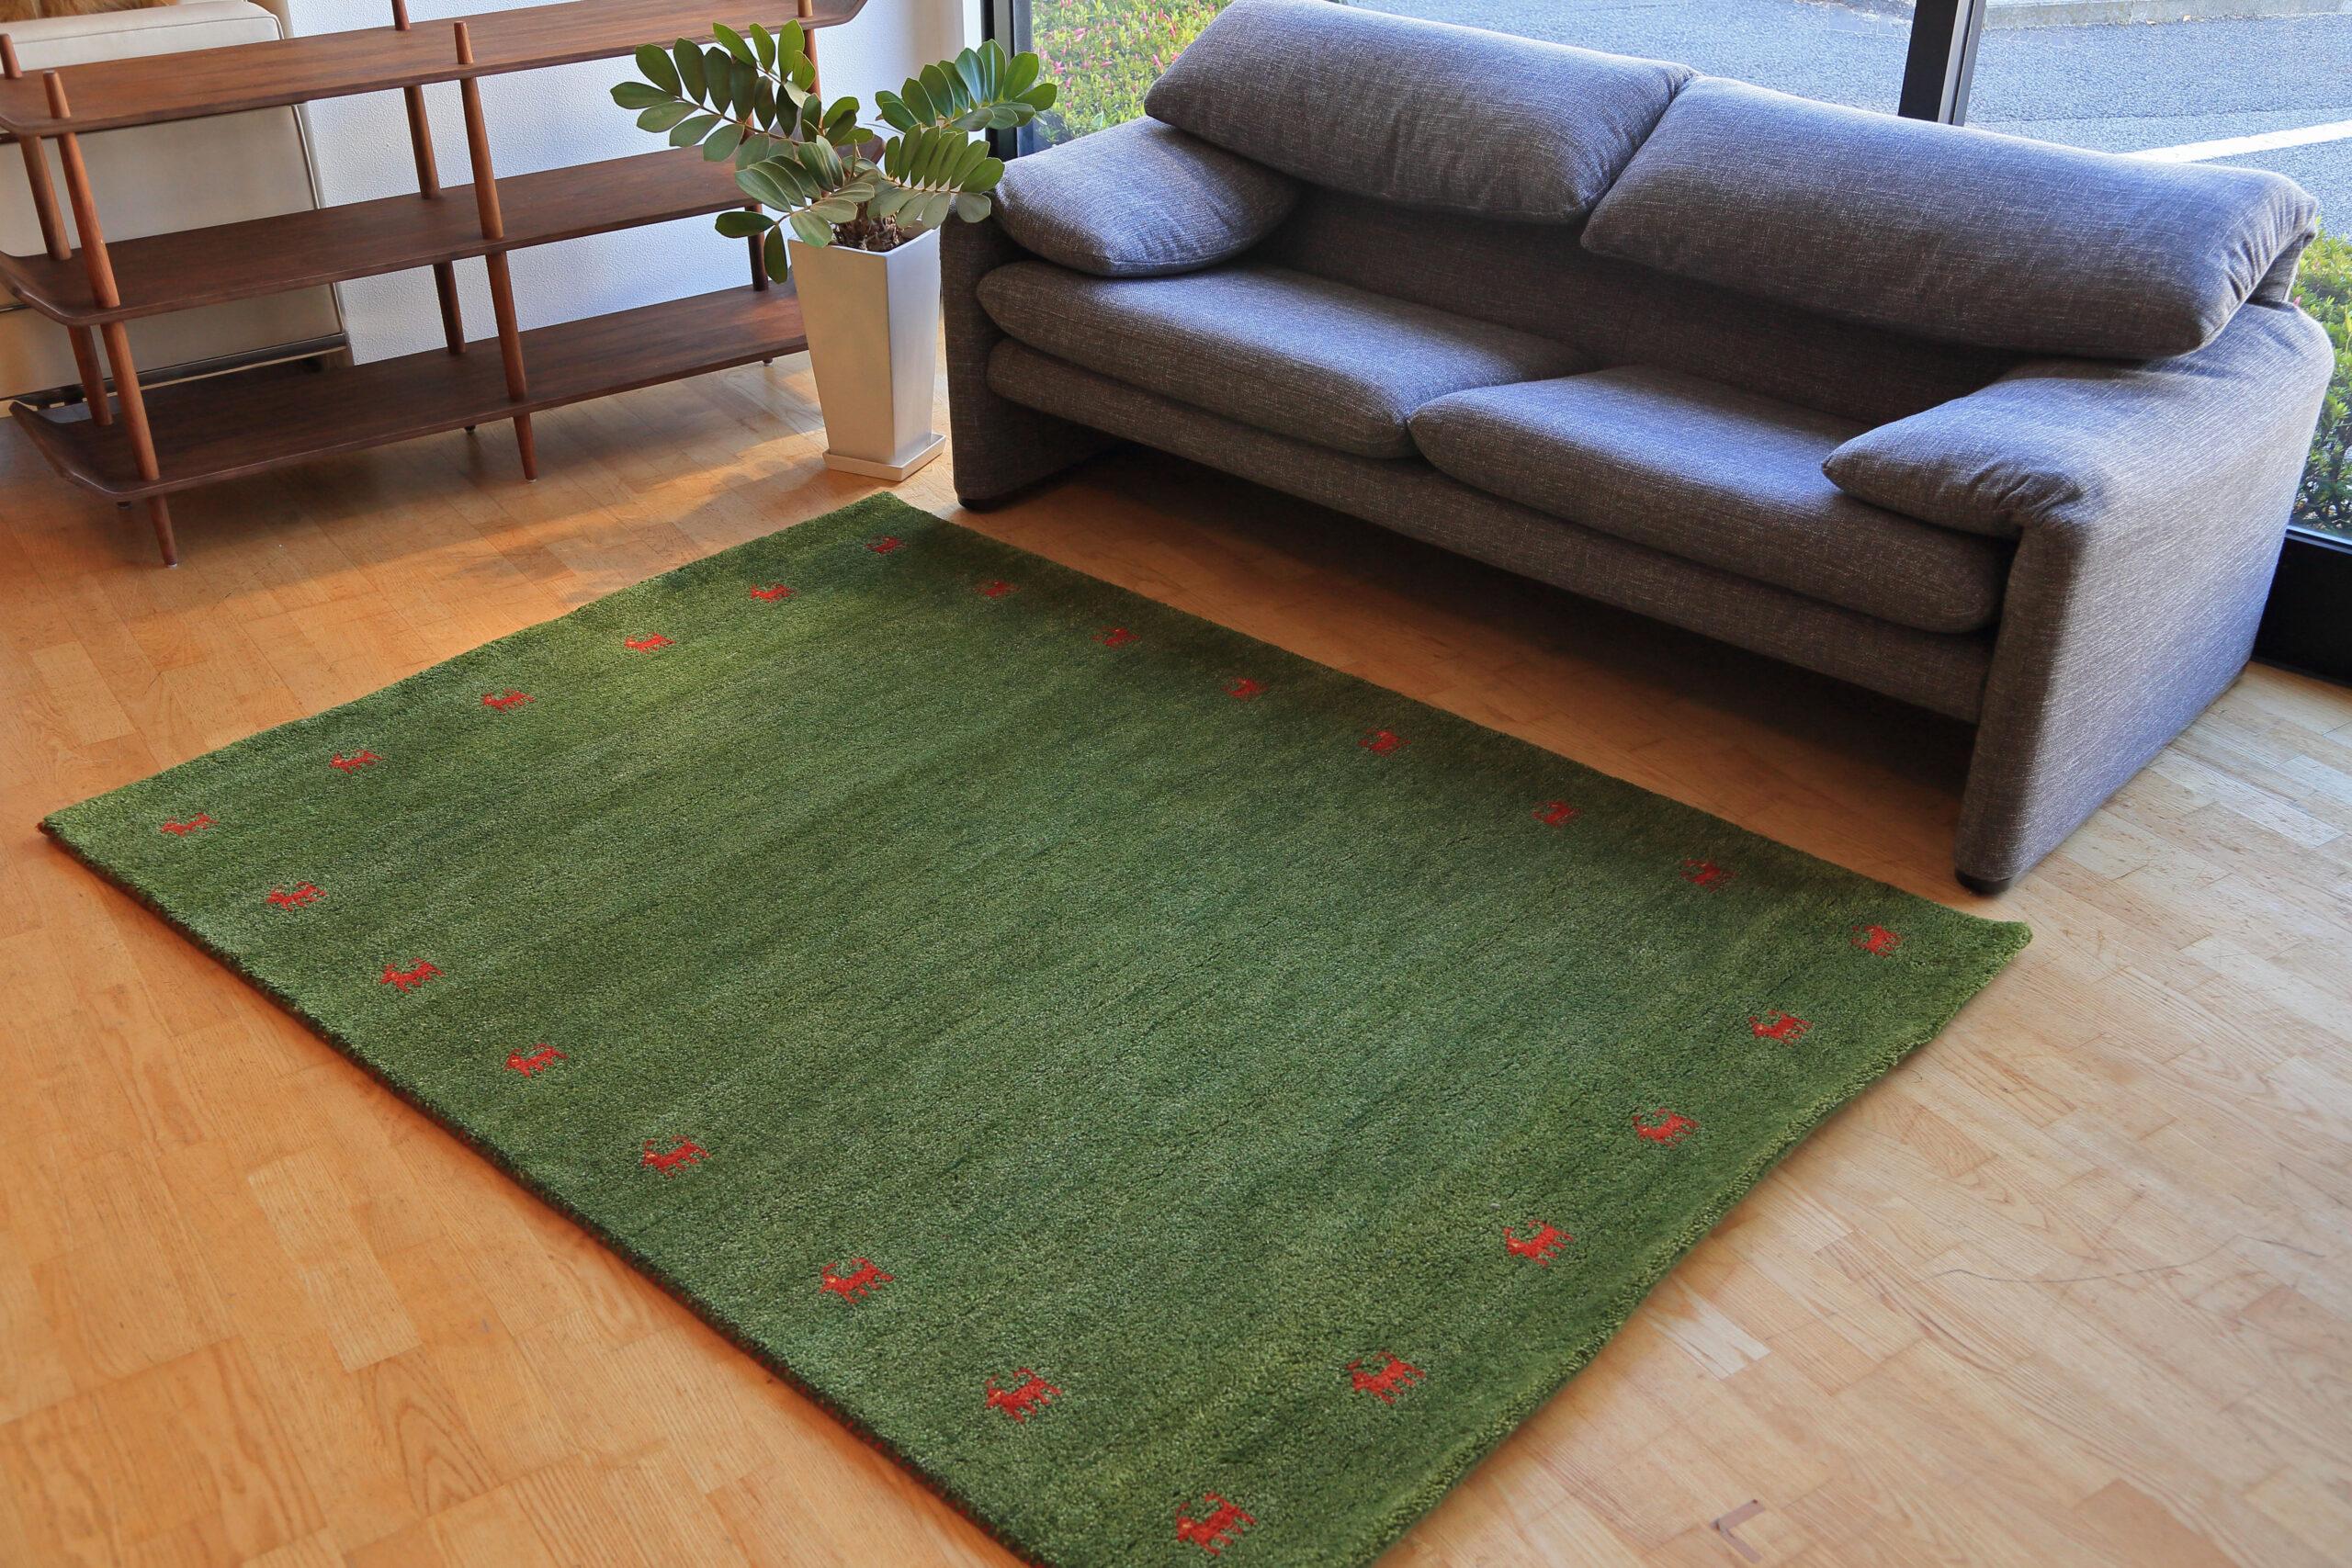 E-comfort 5/28 ハンドノッテッド ギャッベ 230x160cm  No.101 グリーン |